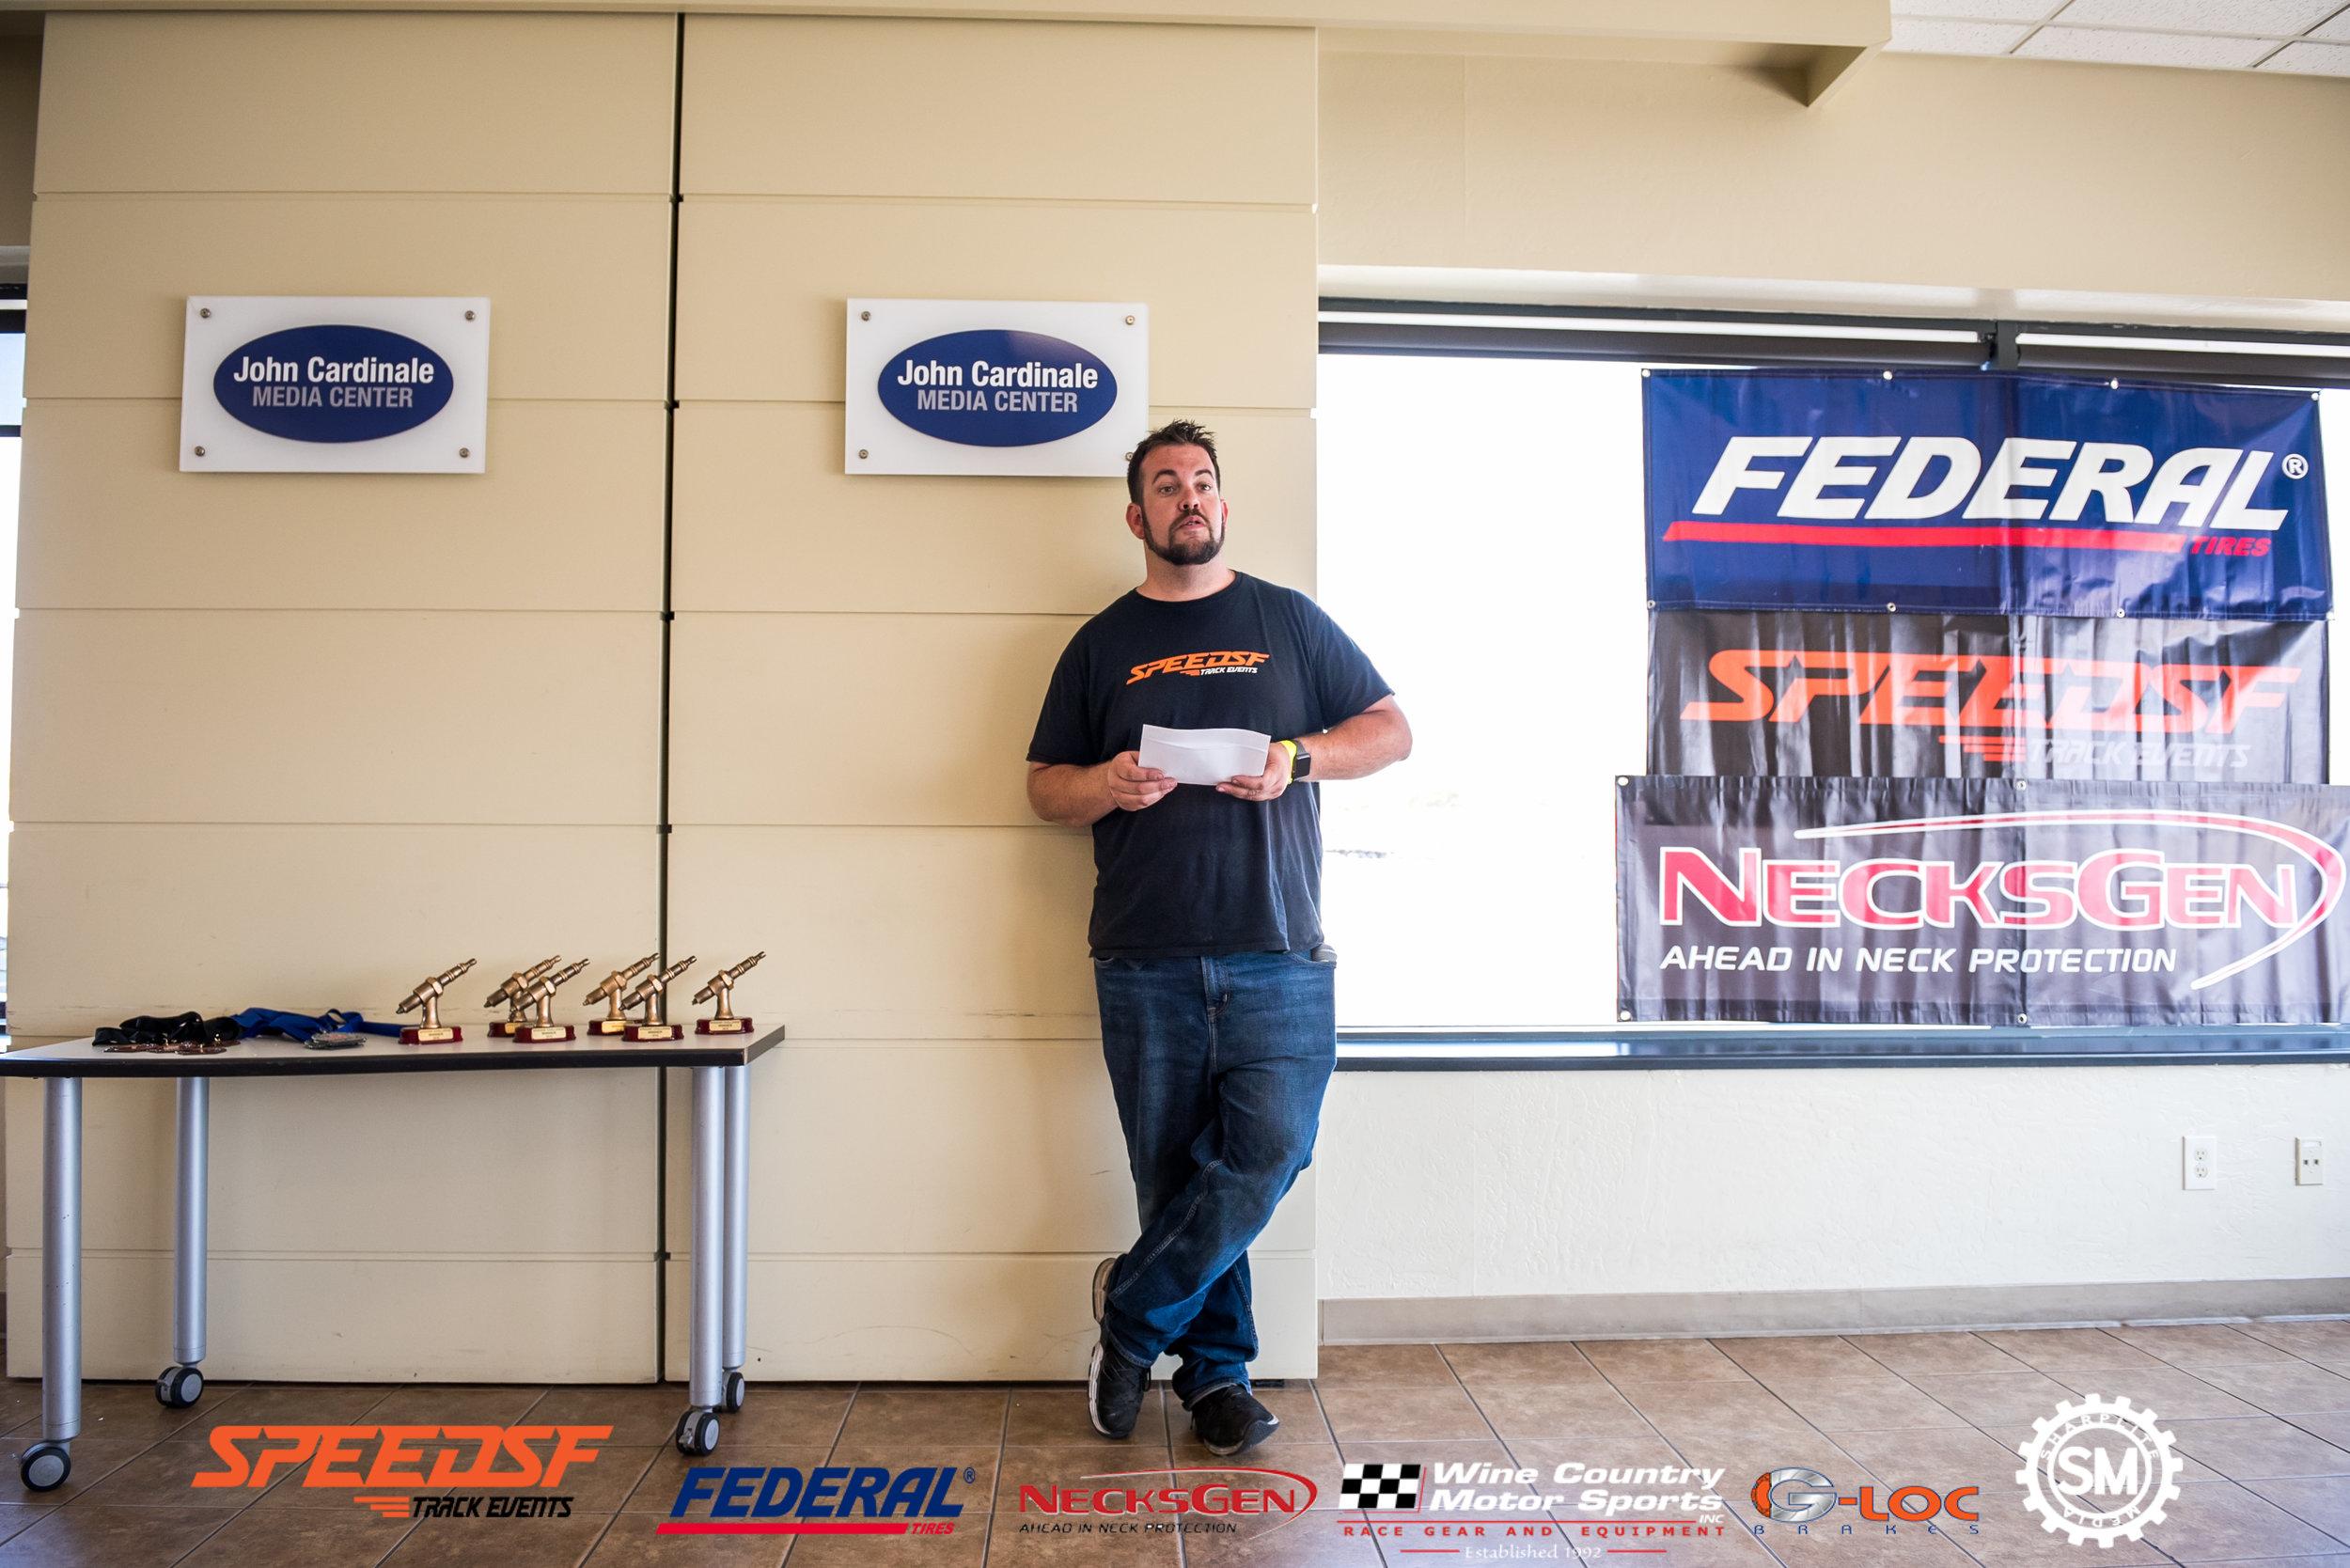 Sonoma Raceway_Monday_SpeedSF_PADDOCK-26.jpg